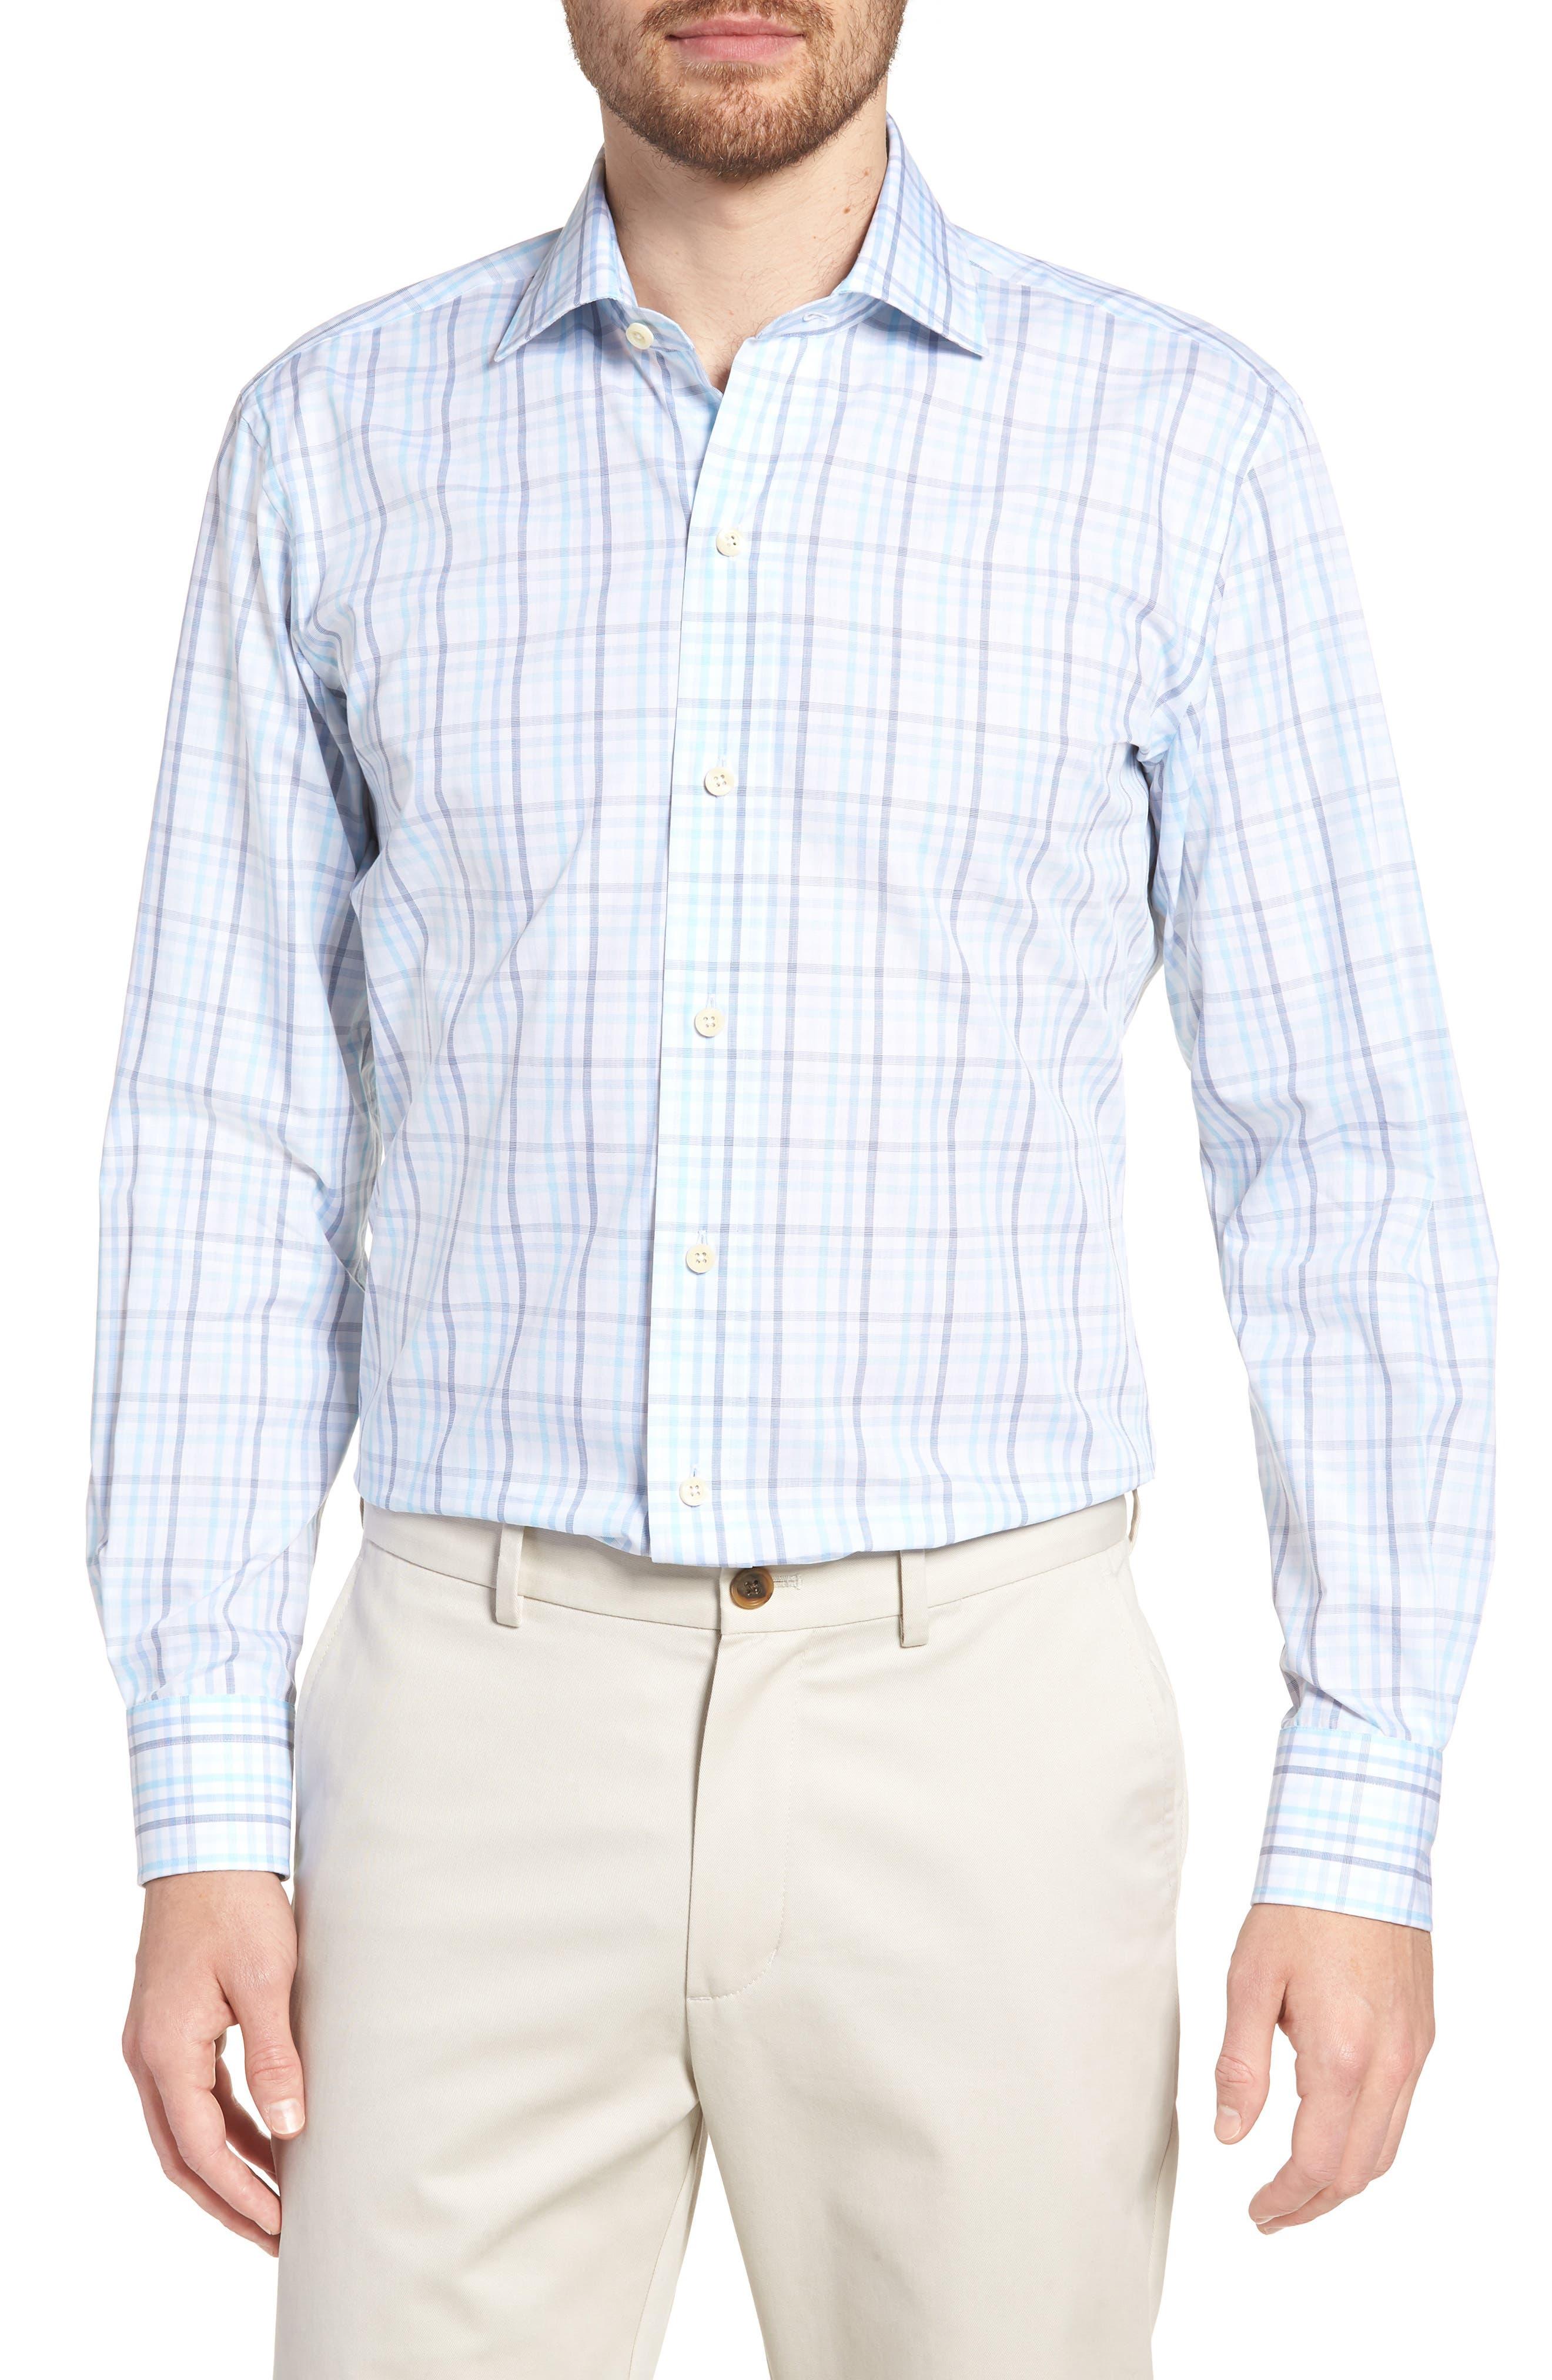 Pelton Slim Fit Check Dress Shirt,                         Main,                         color, 439